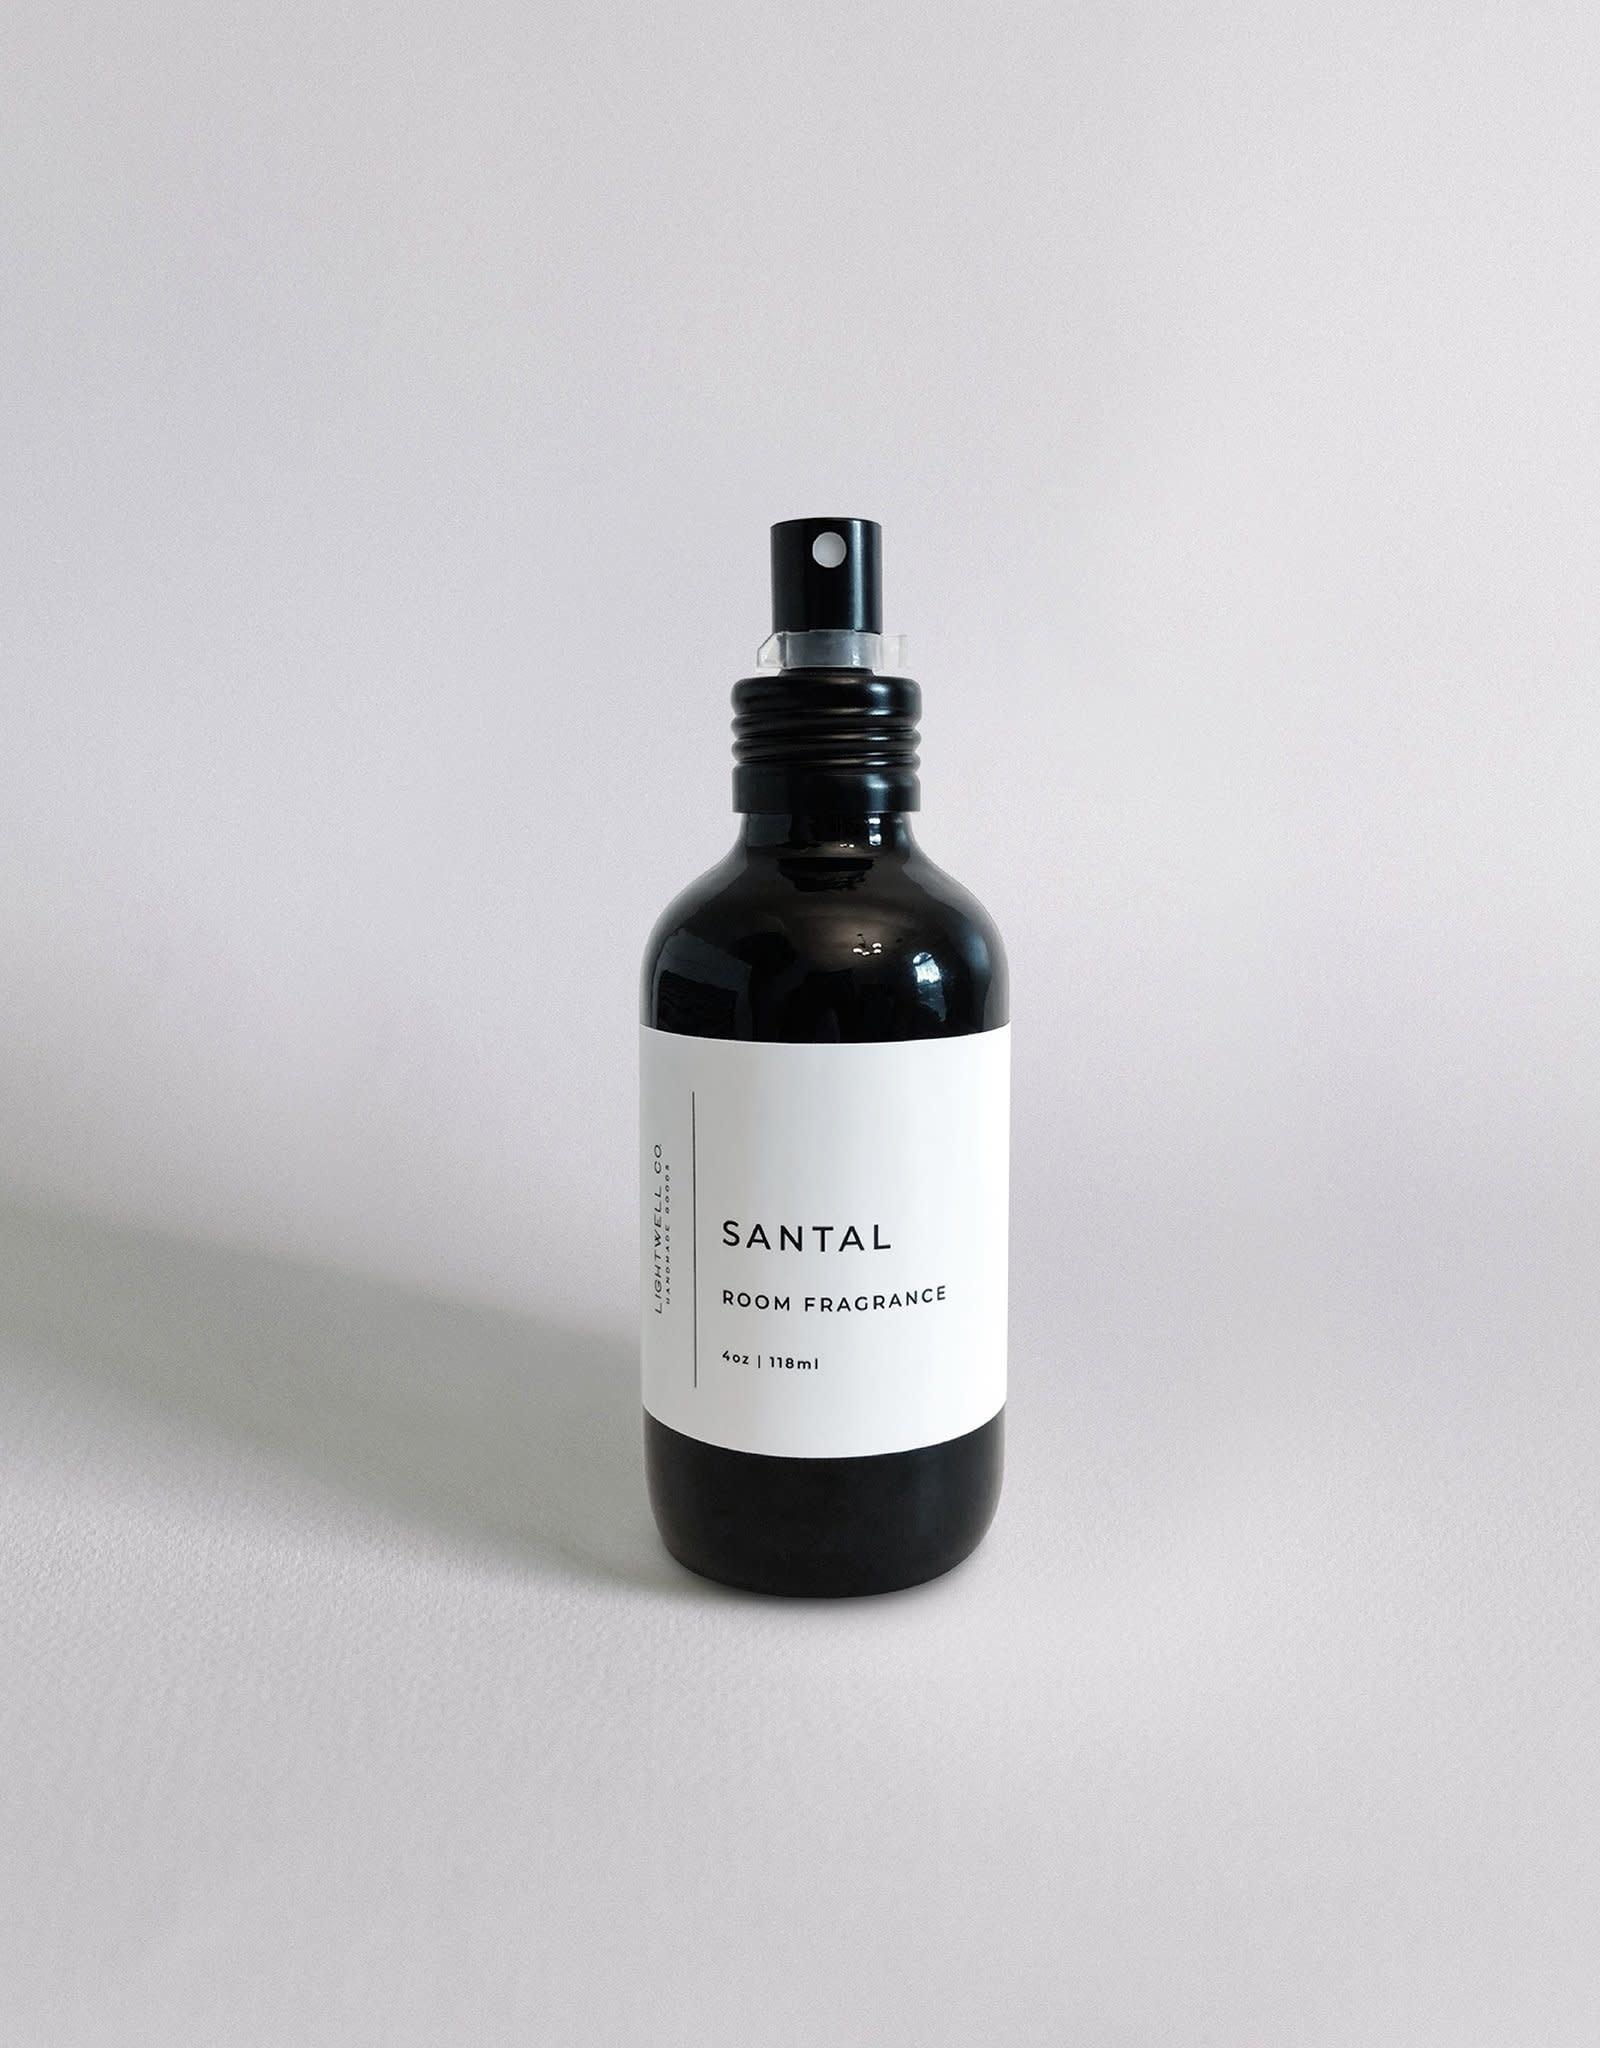 Santal Room Fragrance